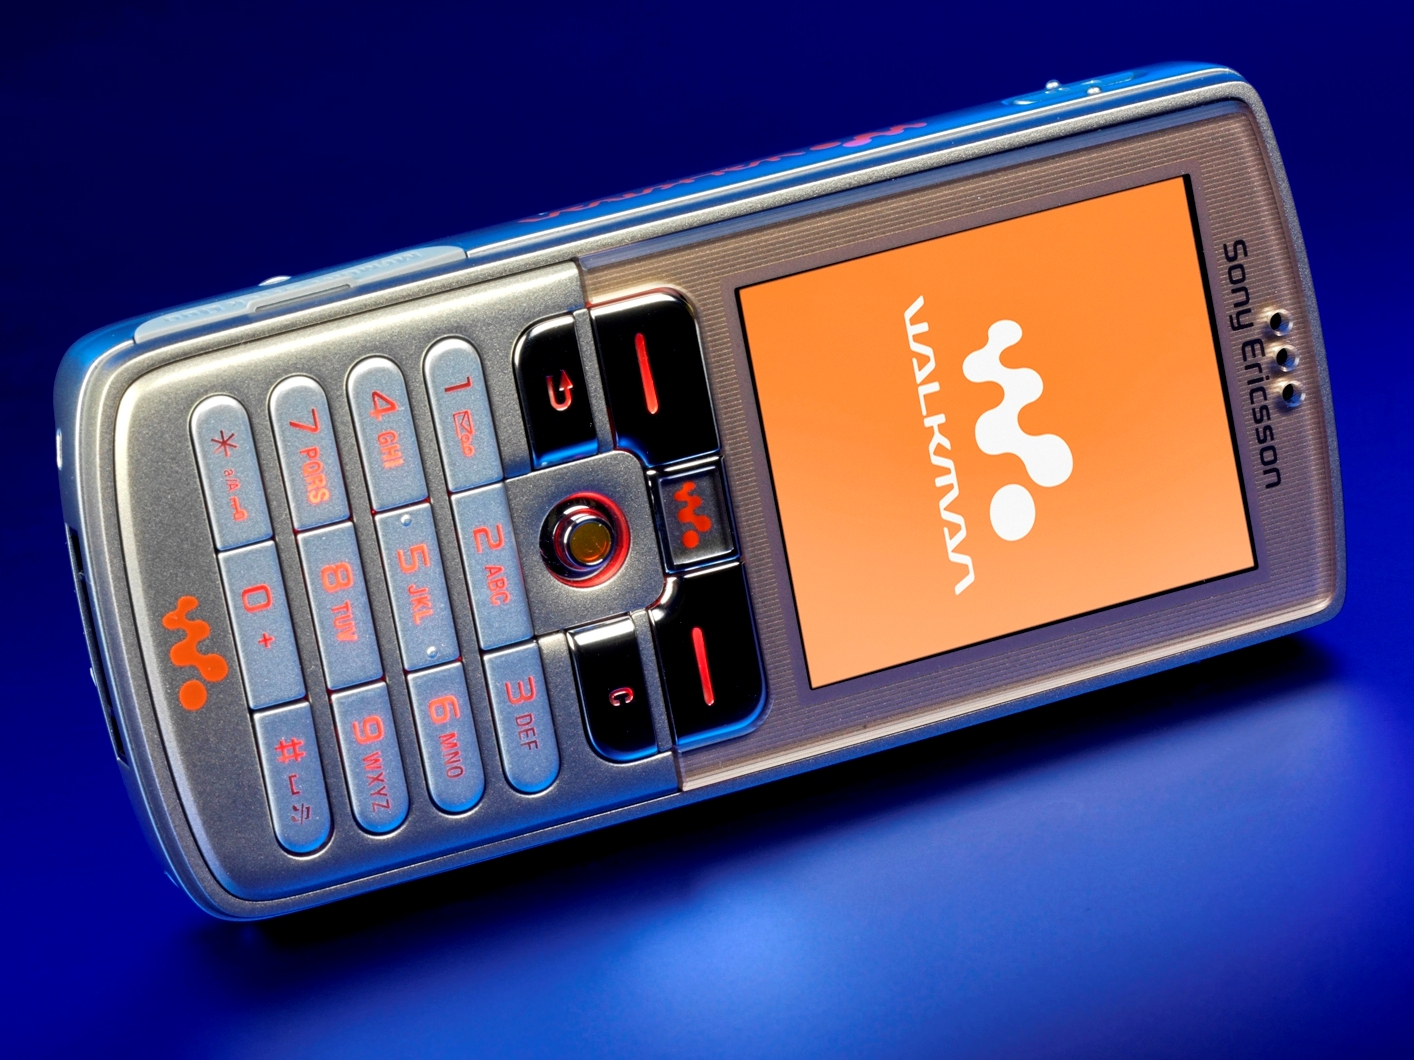 Включение телефона Инструкция по эксплуатации Sony Ericsson S500I DARK 89